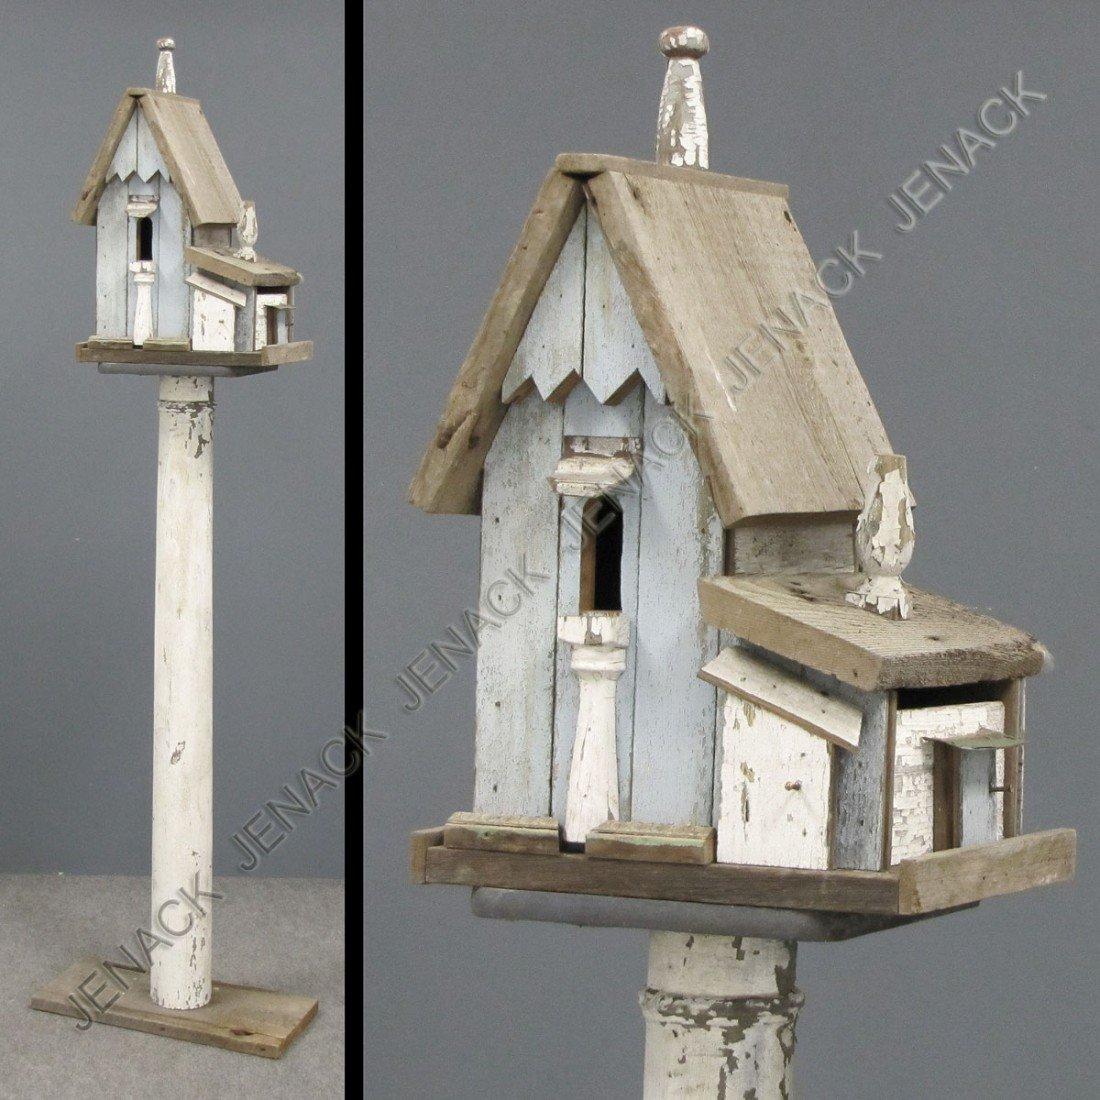 53: VINTAGE FOLK ART PAINTED COTTAGE BIRD HOUSE